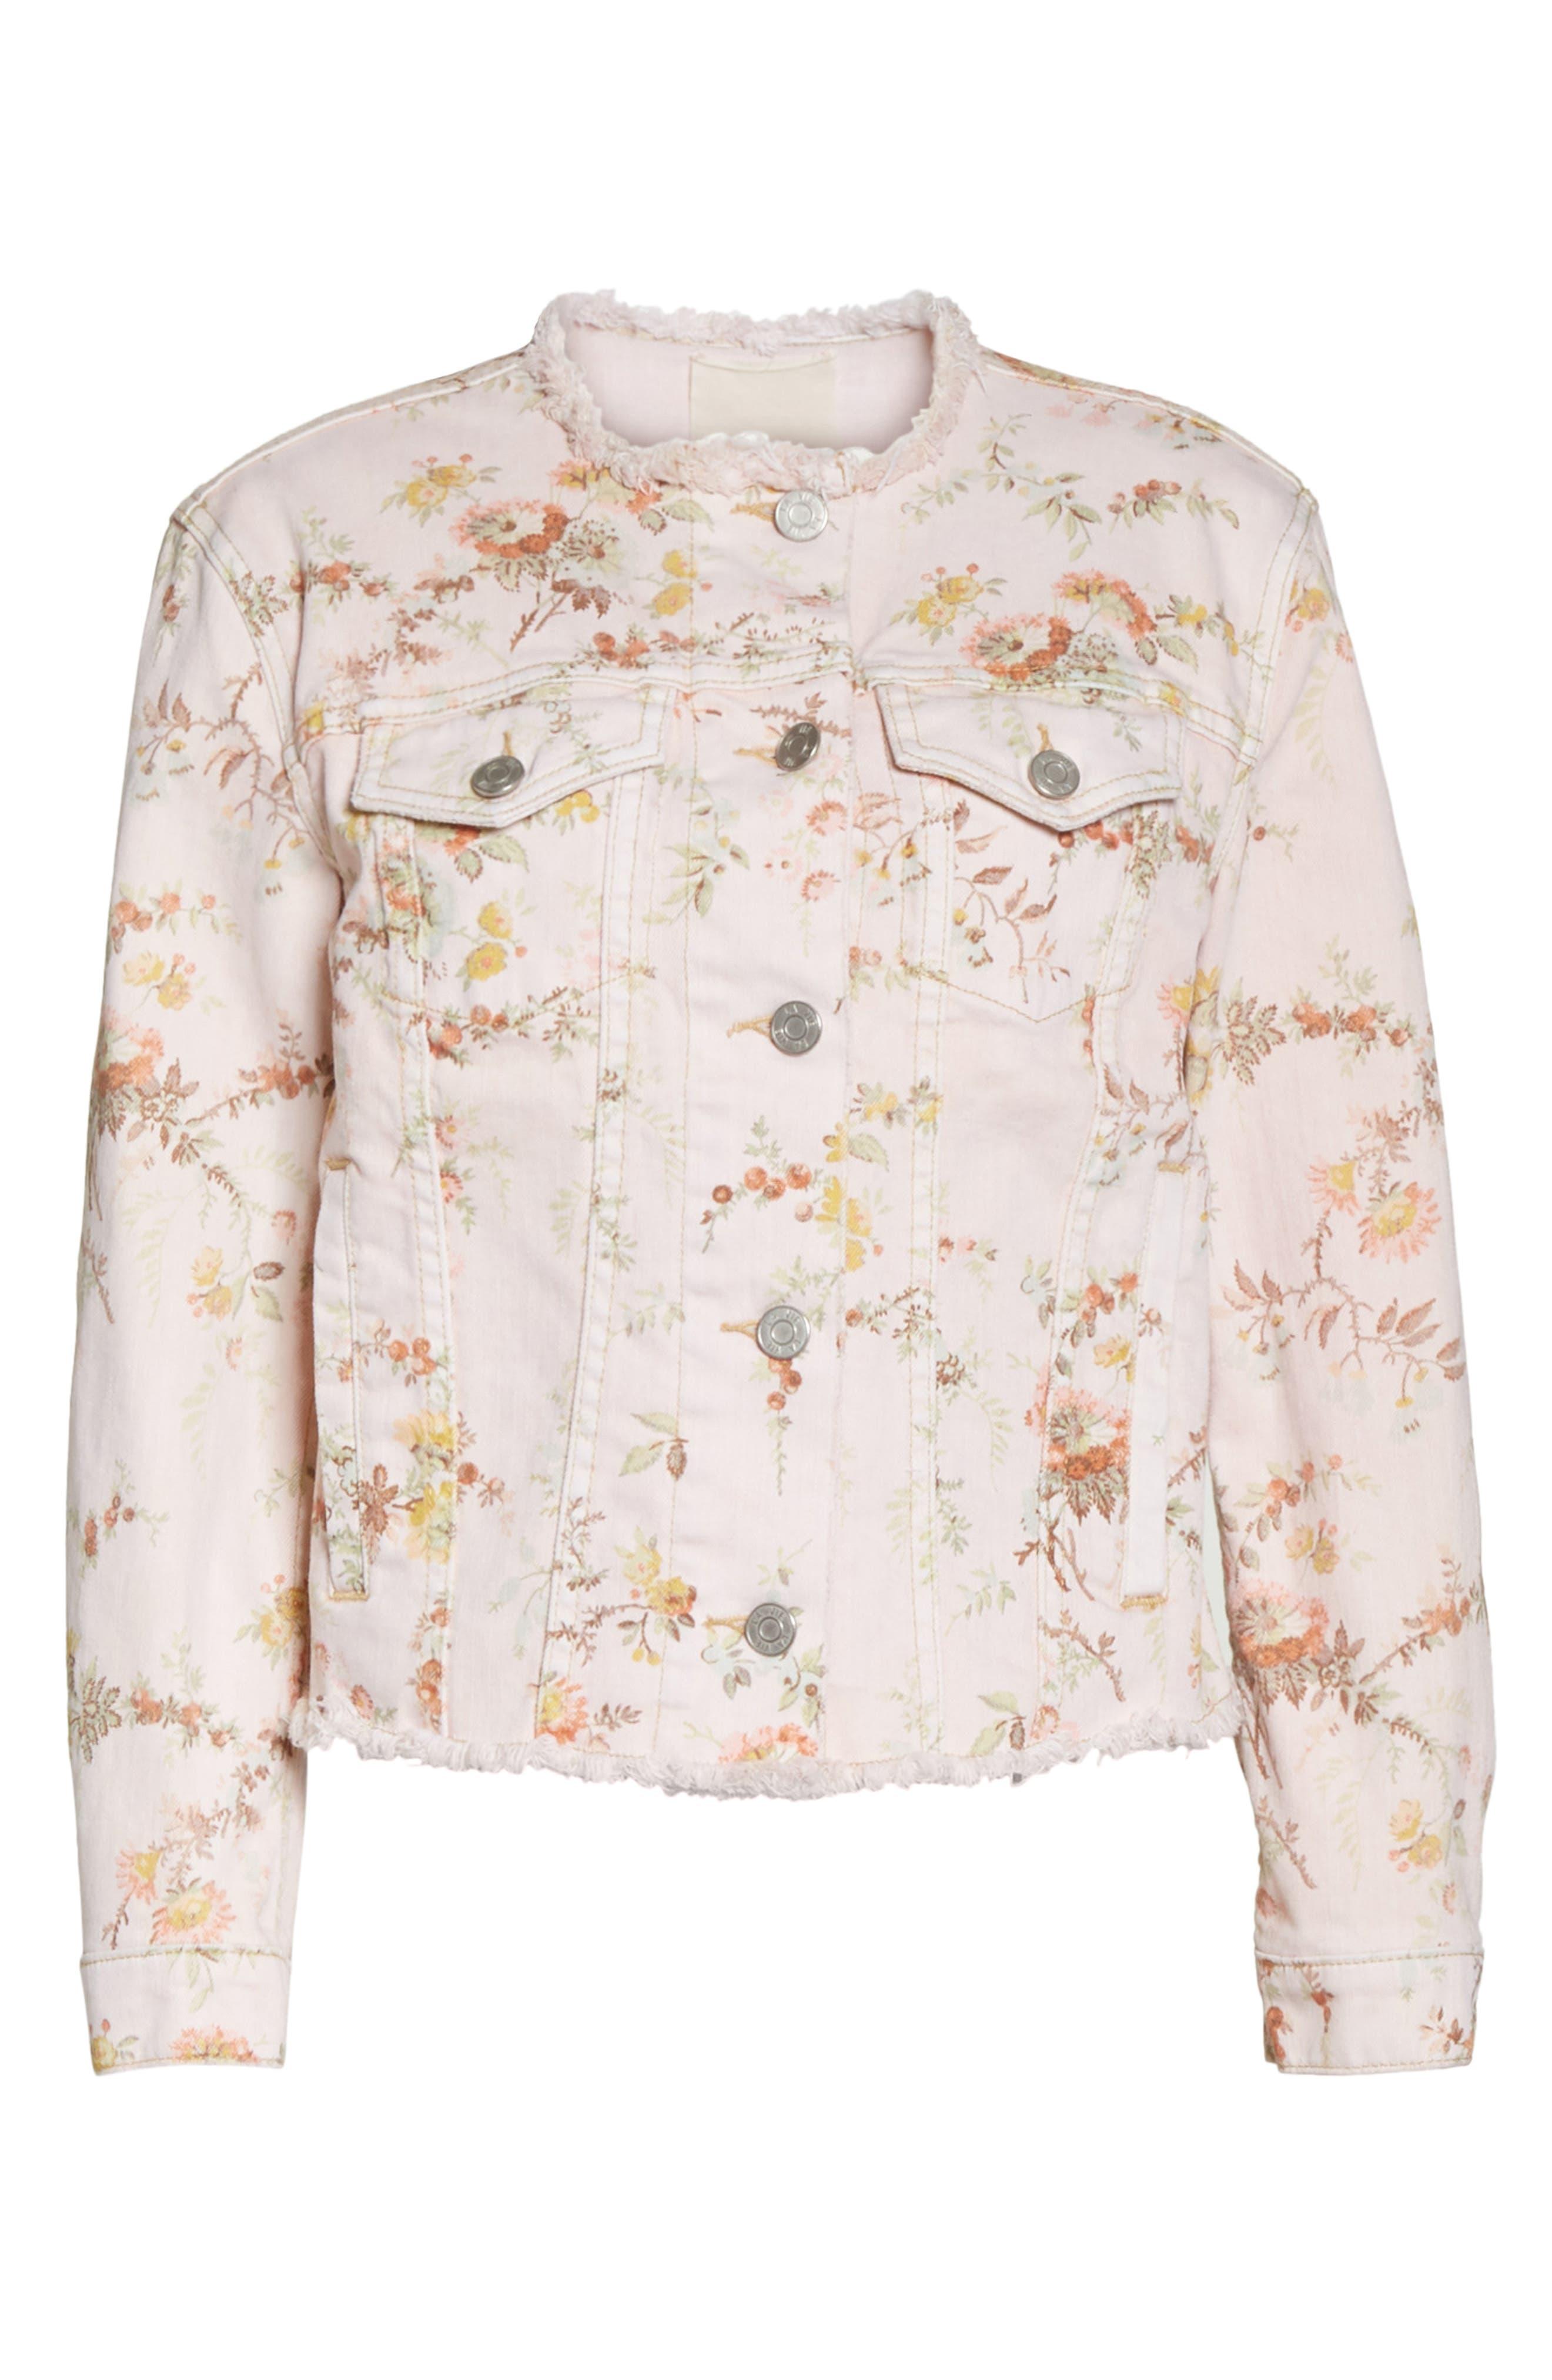 Belle Denim Jacket,                             Alternate thumbnail 5, color,                             903